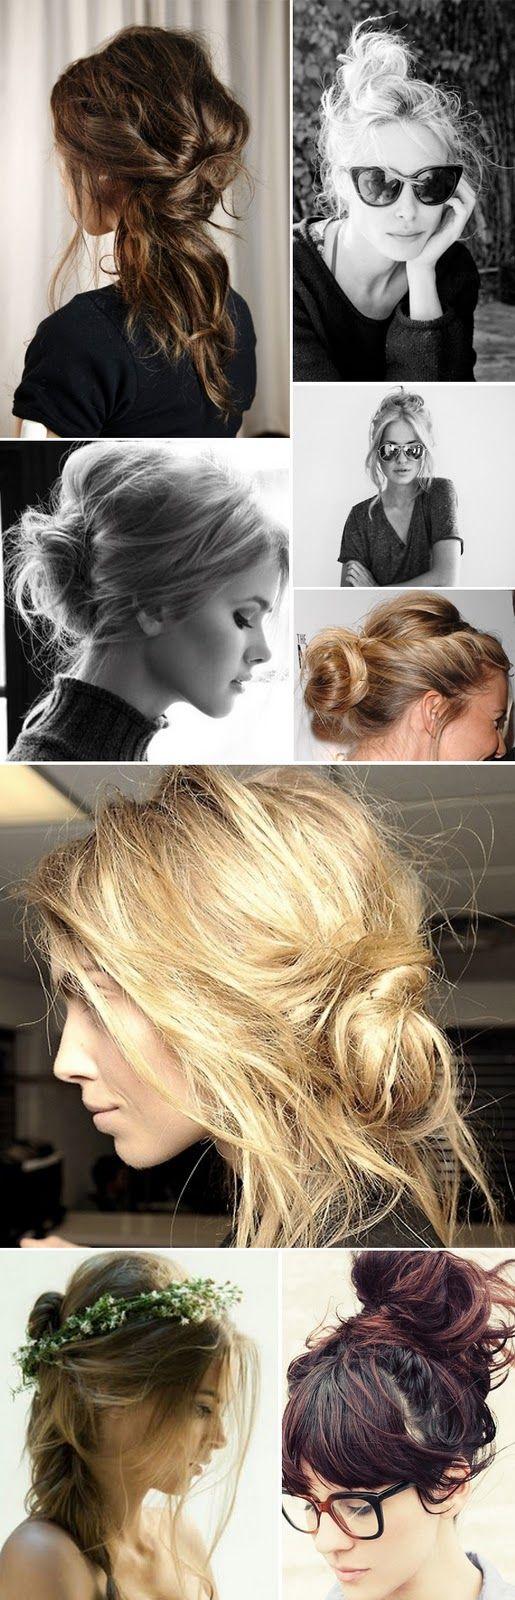 messy beachy hair: Messy Hairstyles, Beaches Hair, Up Dos, Long Hair, Messy Buns, Hair Style, Messy Up Do, Big Hair, Updo